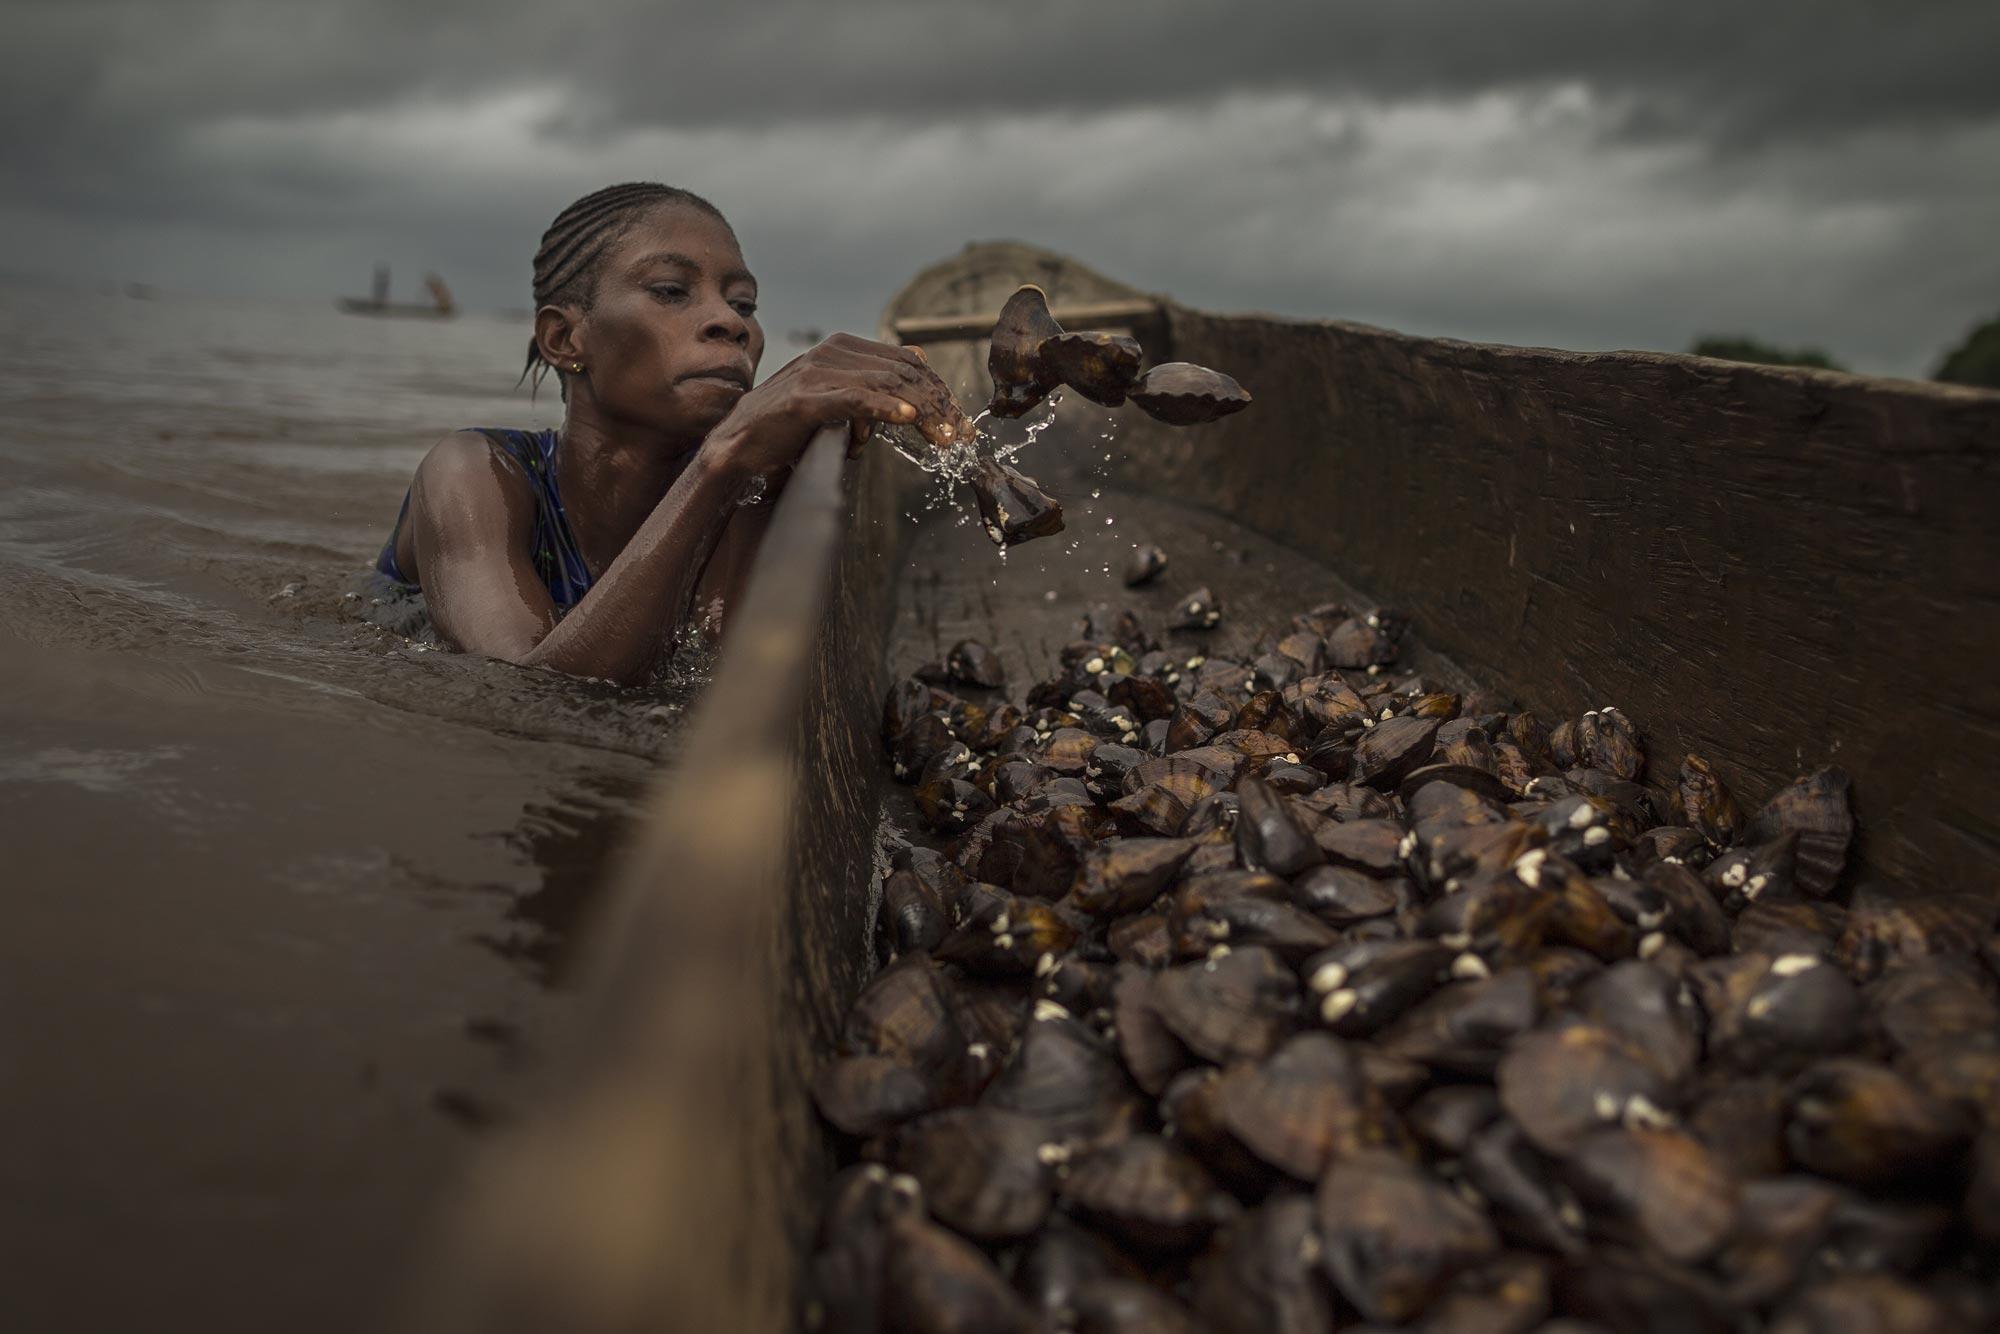 Fotografia documentaria Woman in Water fishing di Kris Pannecoucke